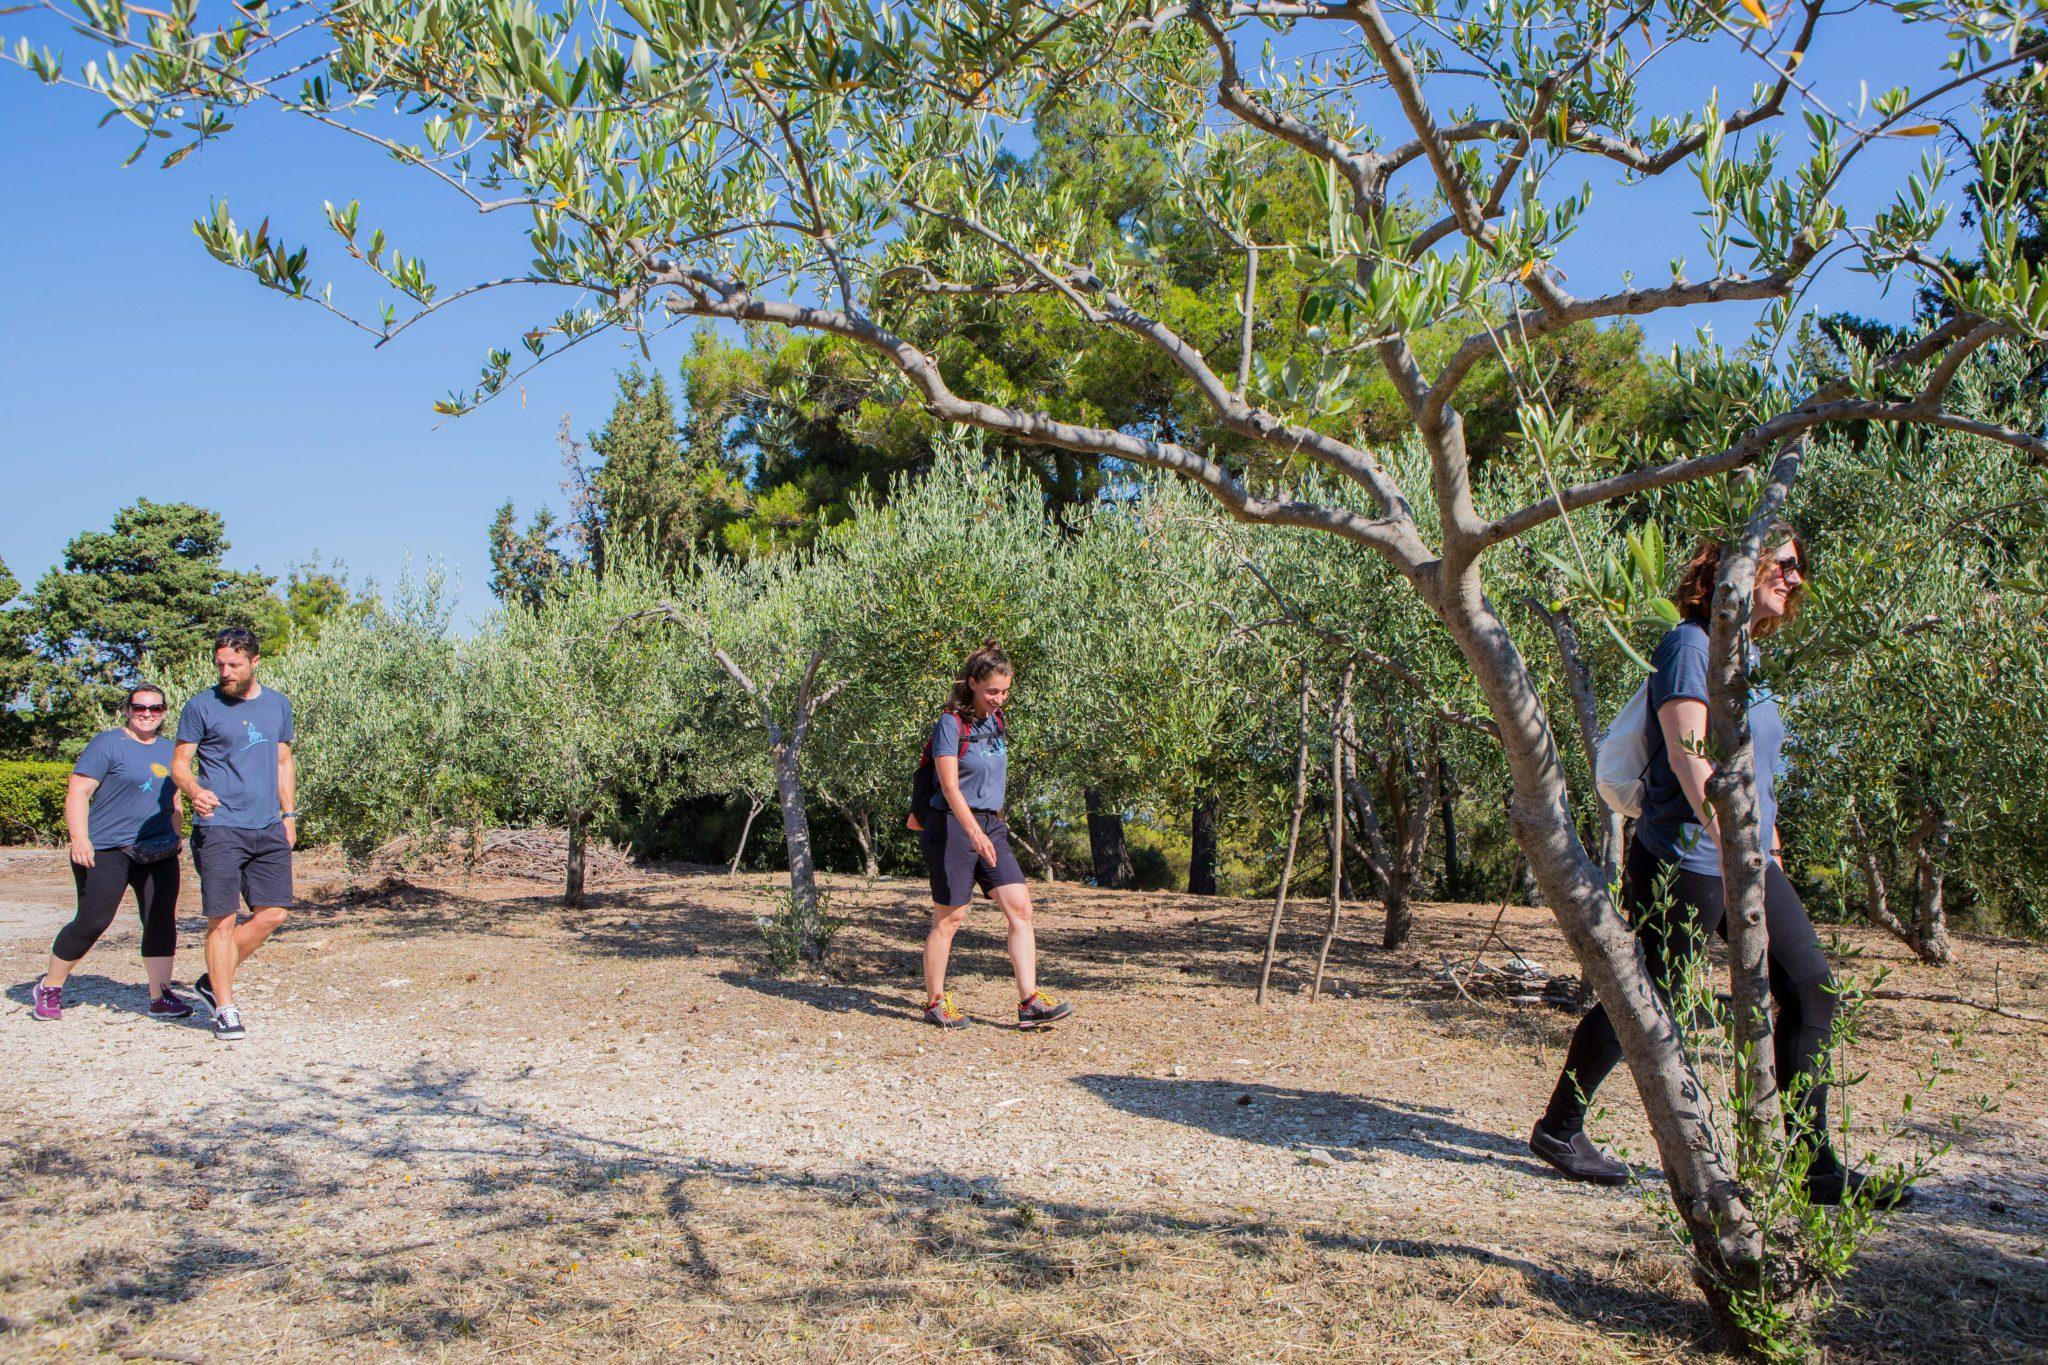 Hike & Swim Croatia: Summer Dalmatian Coast Walking Holiday